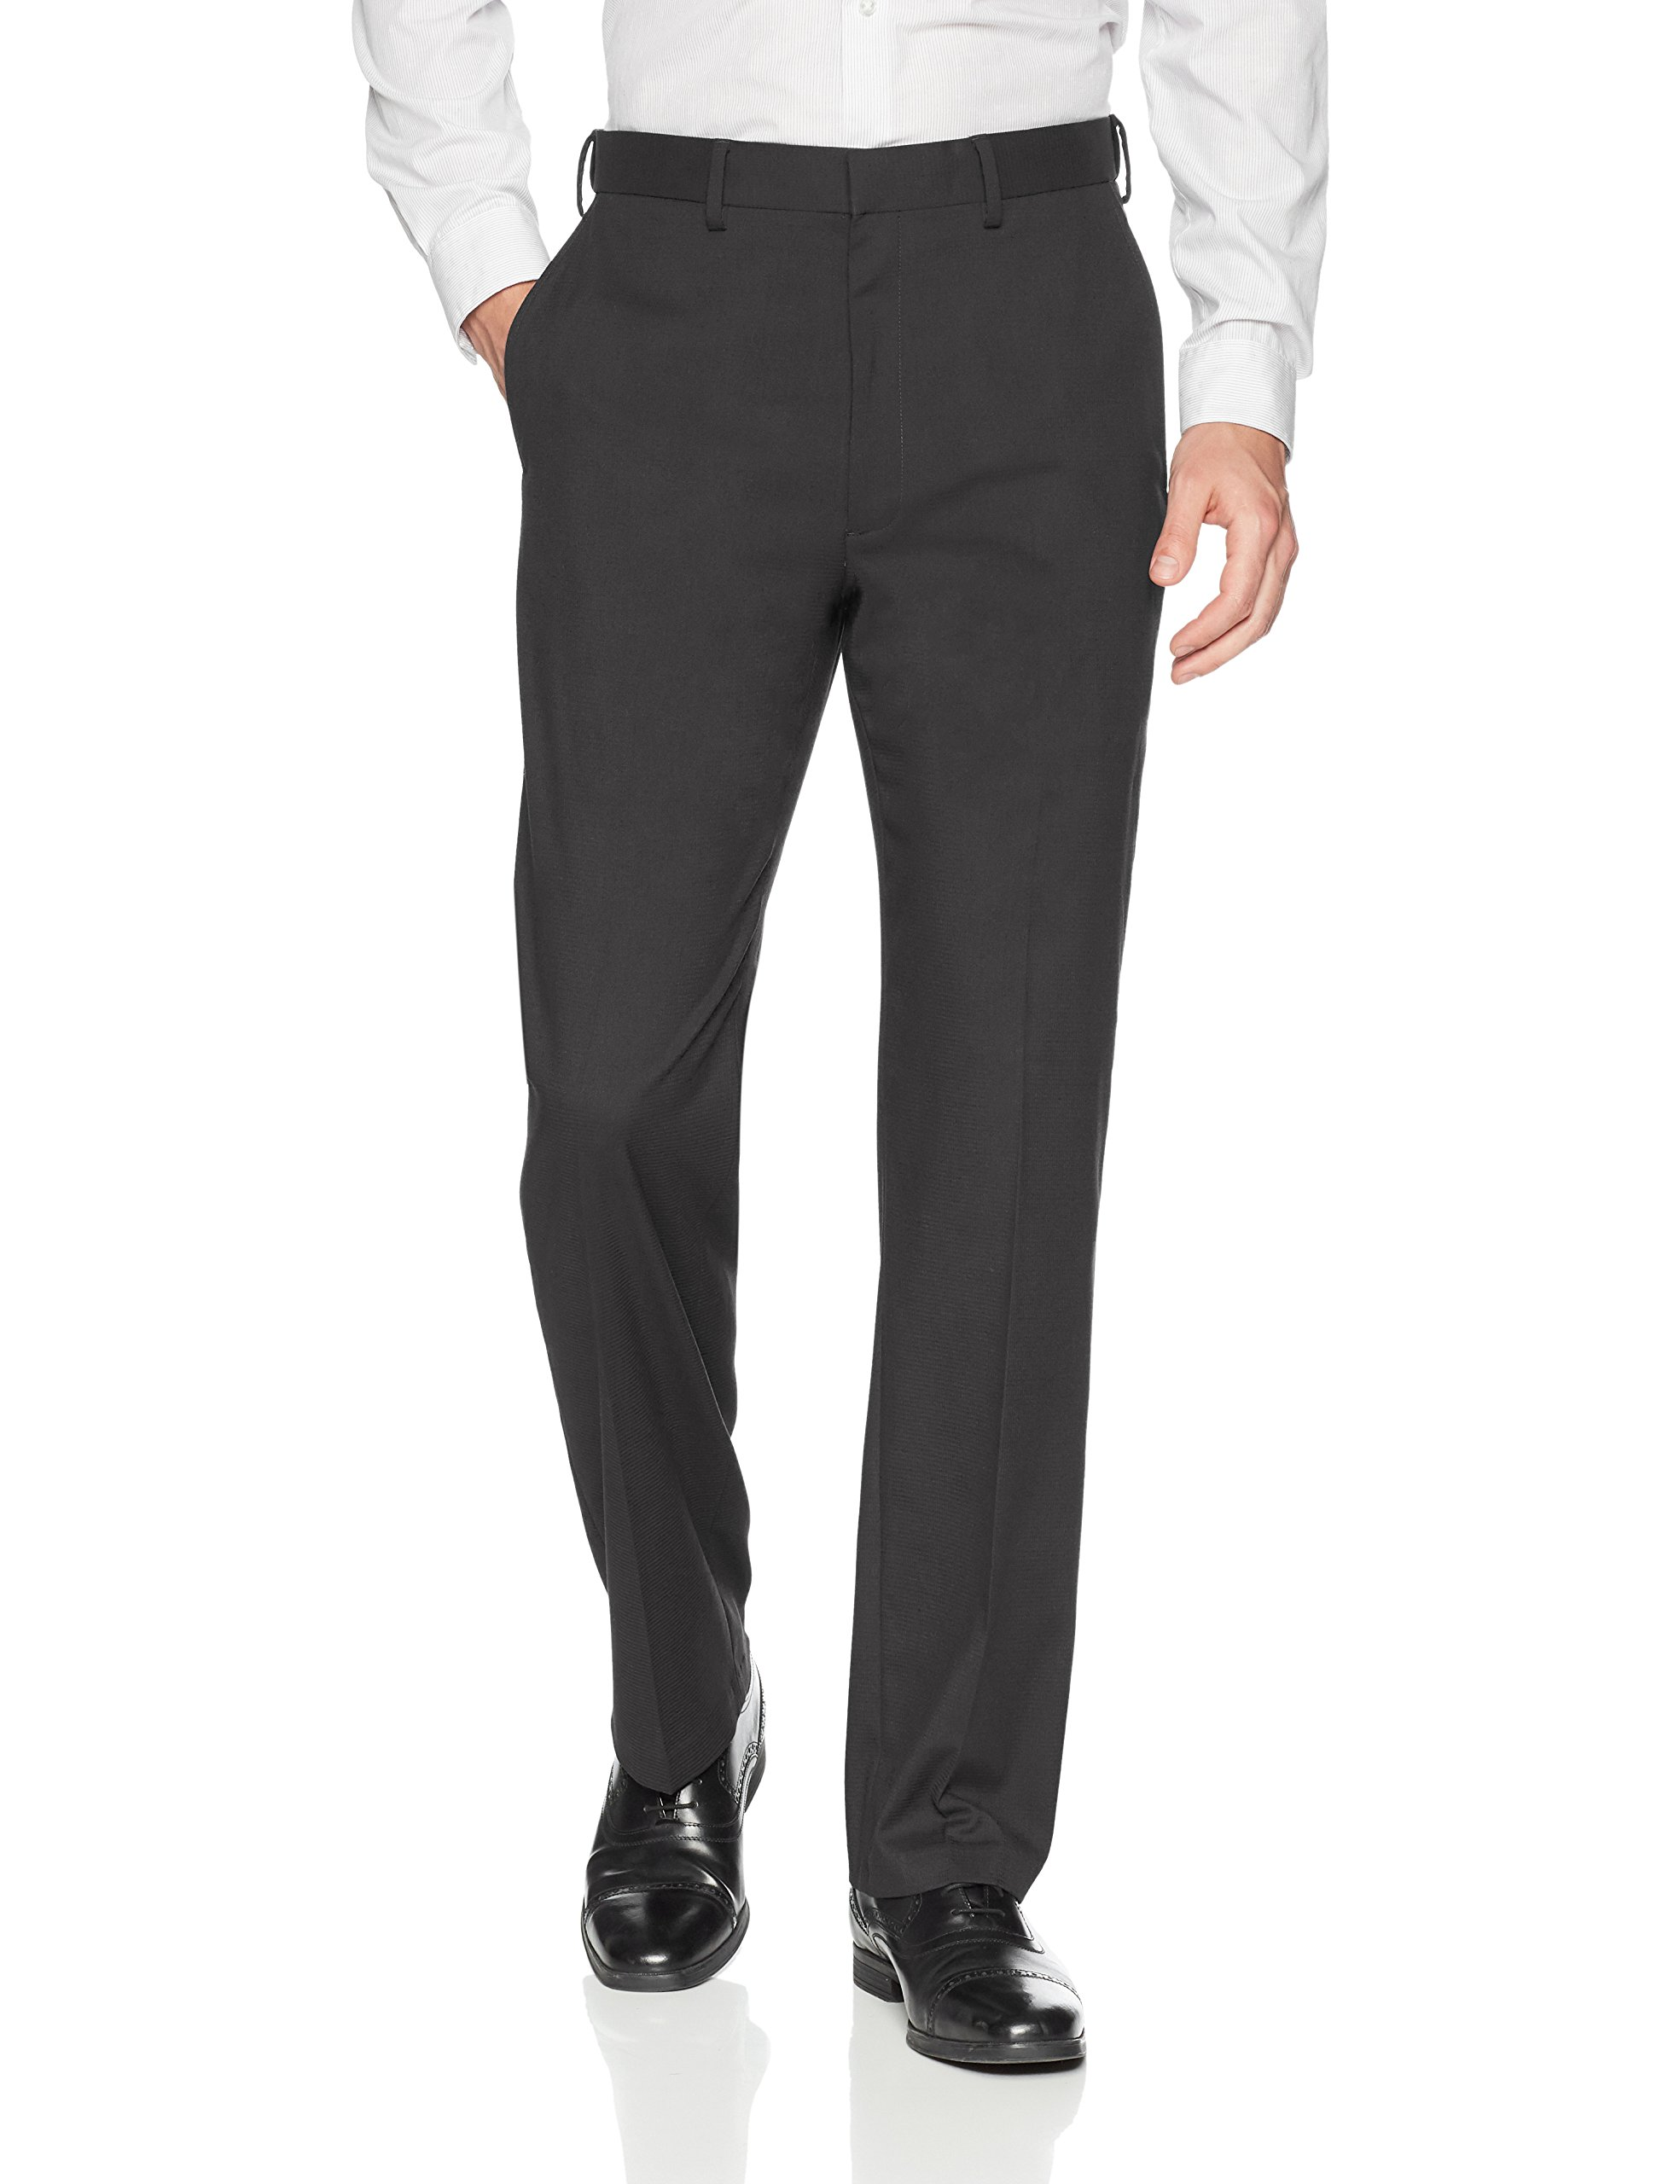 Haggar Men's J.m Premium Check Classic Fit Suit Separate Pant, Black, 34Wx30L